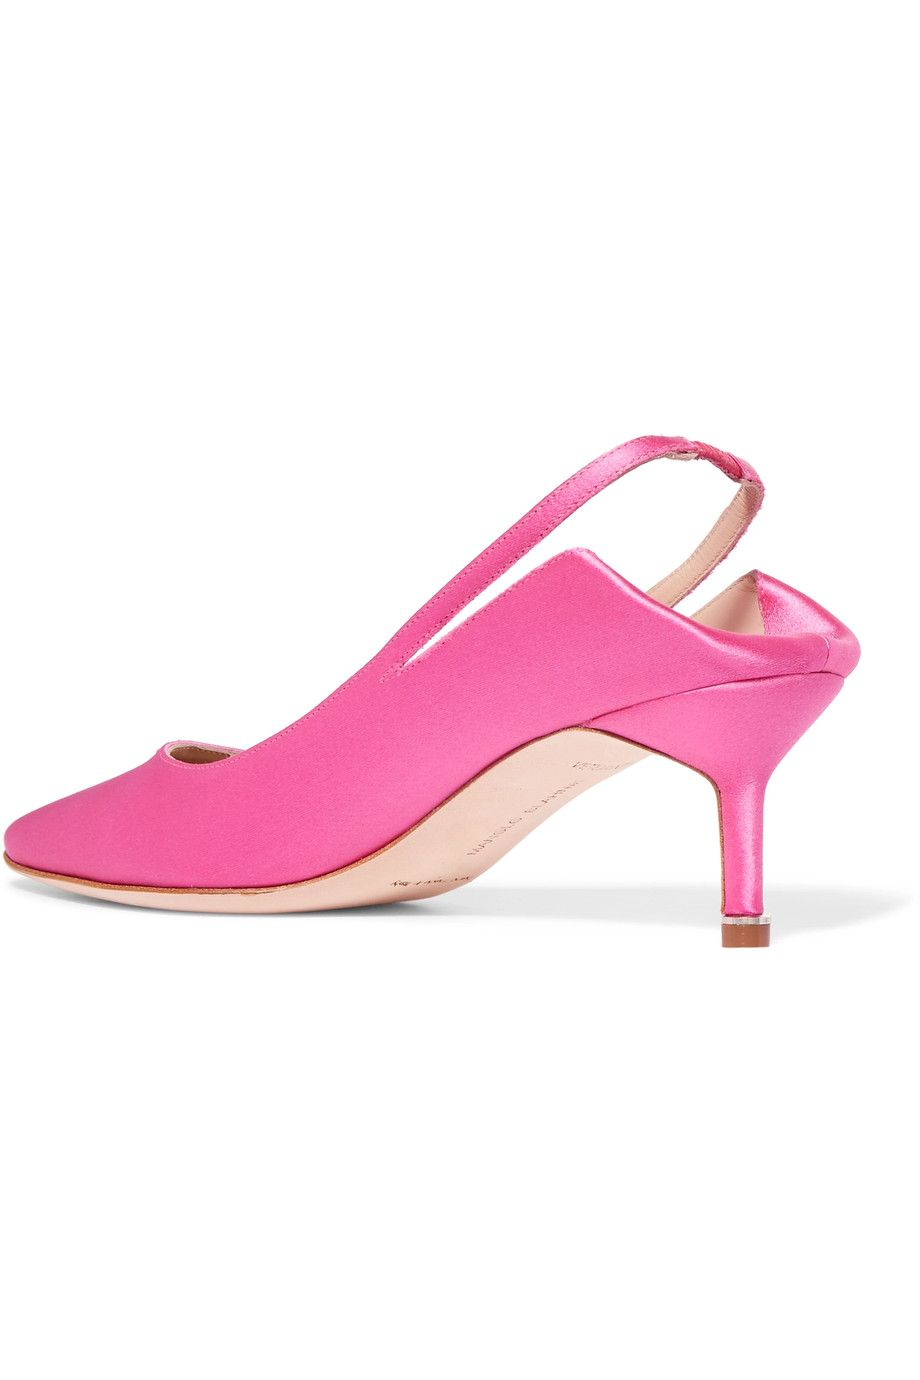 + Manolo Blahnik Satin Slingback Pumps - Bright pink VETEMENTS KQzF6